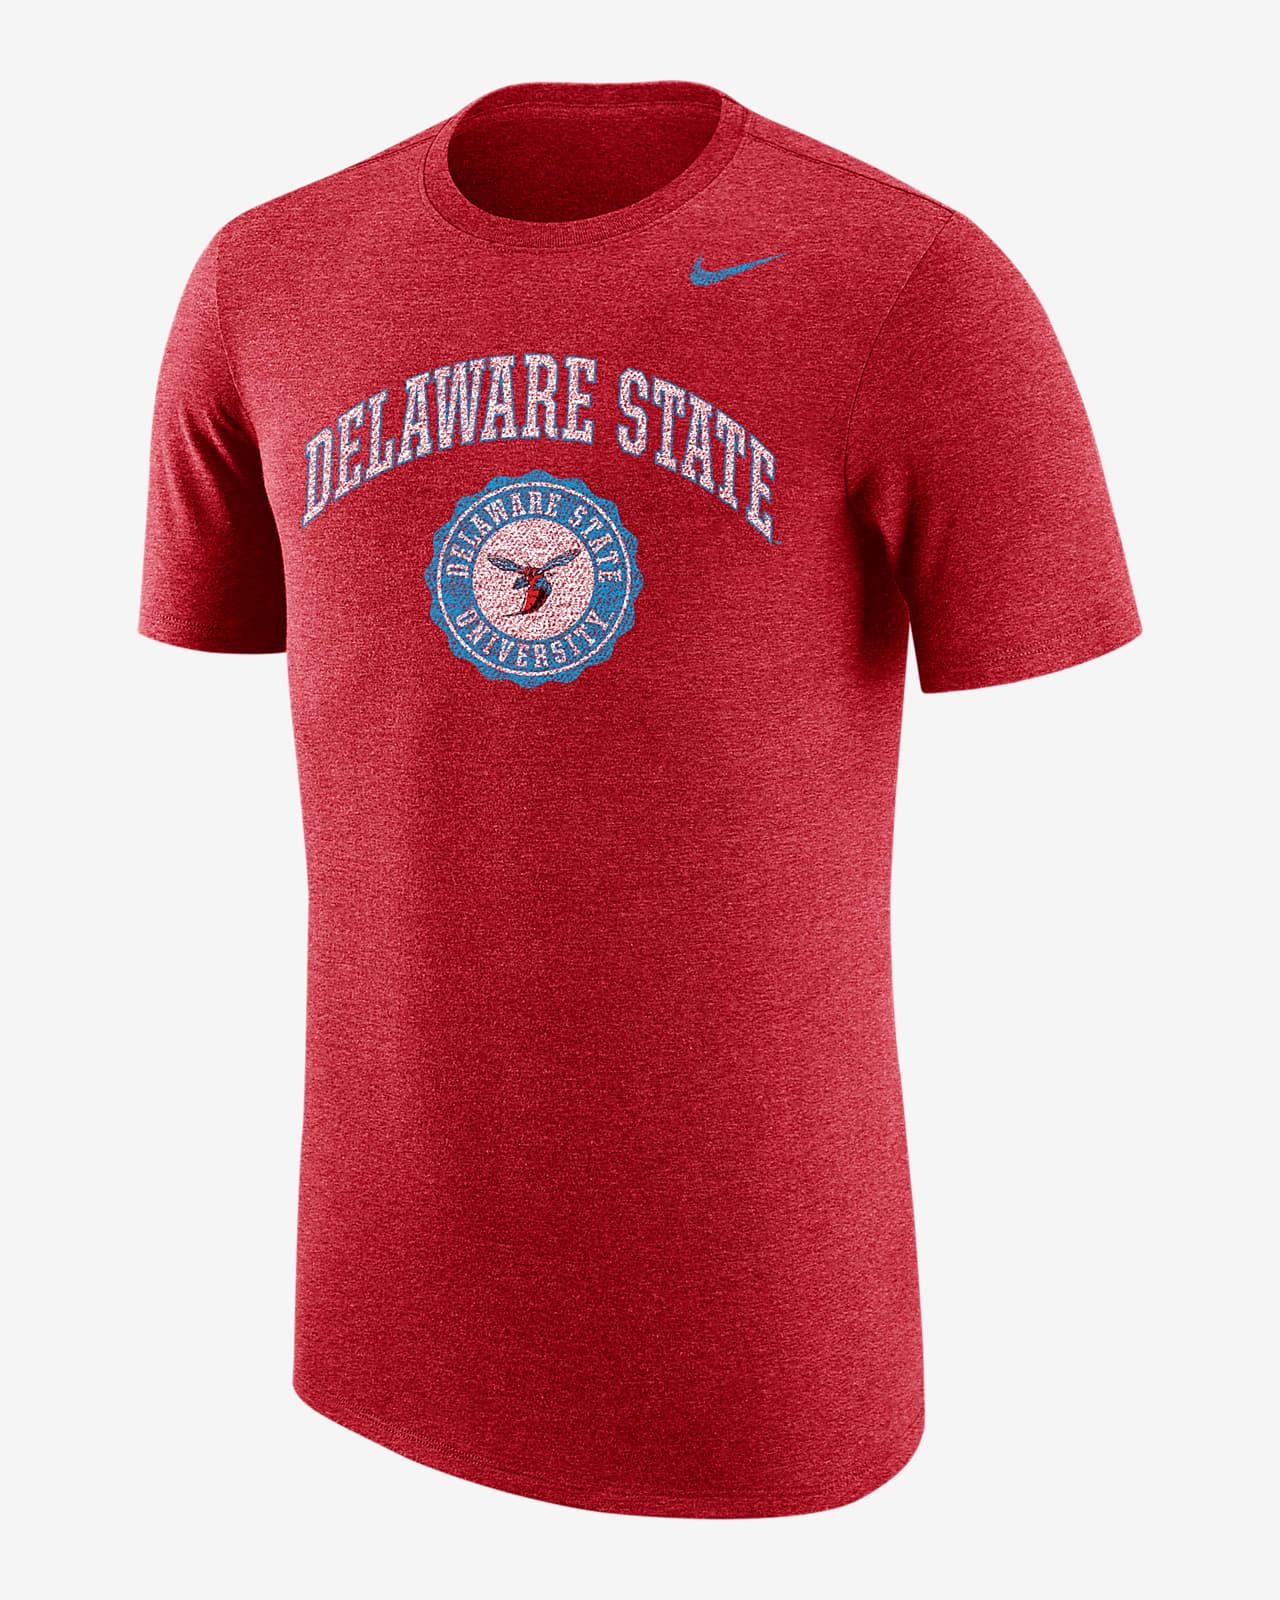 Nike College (Delaware State) Men's T-Shirt